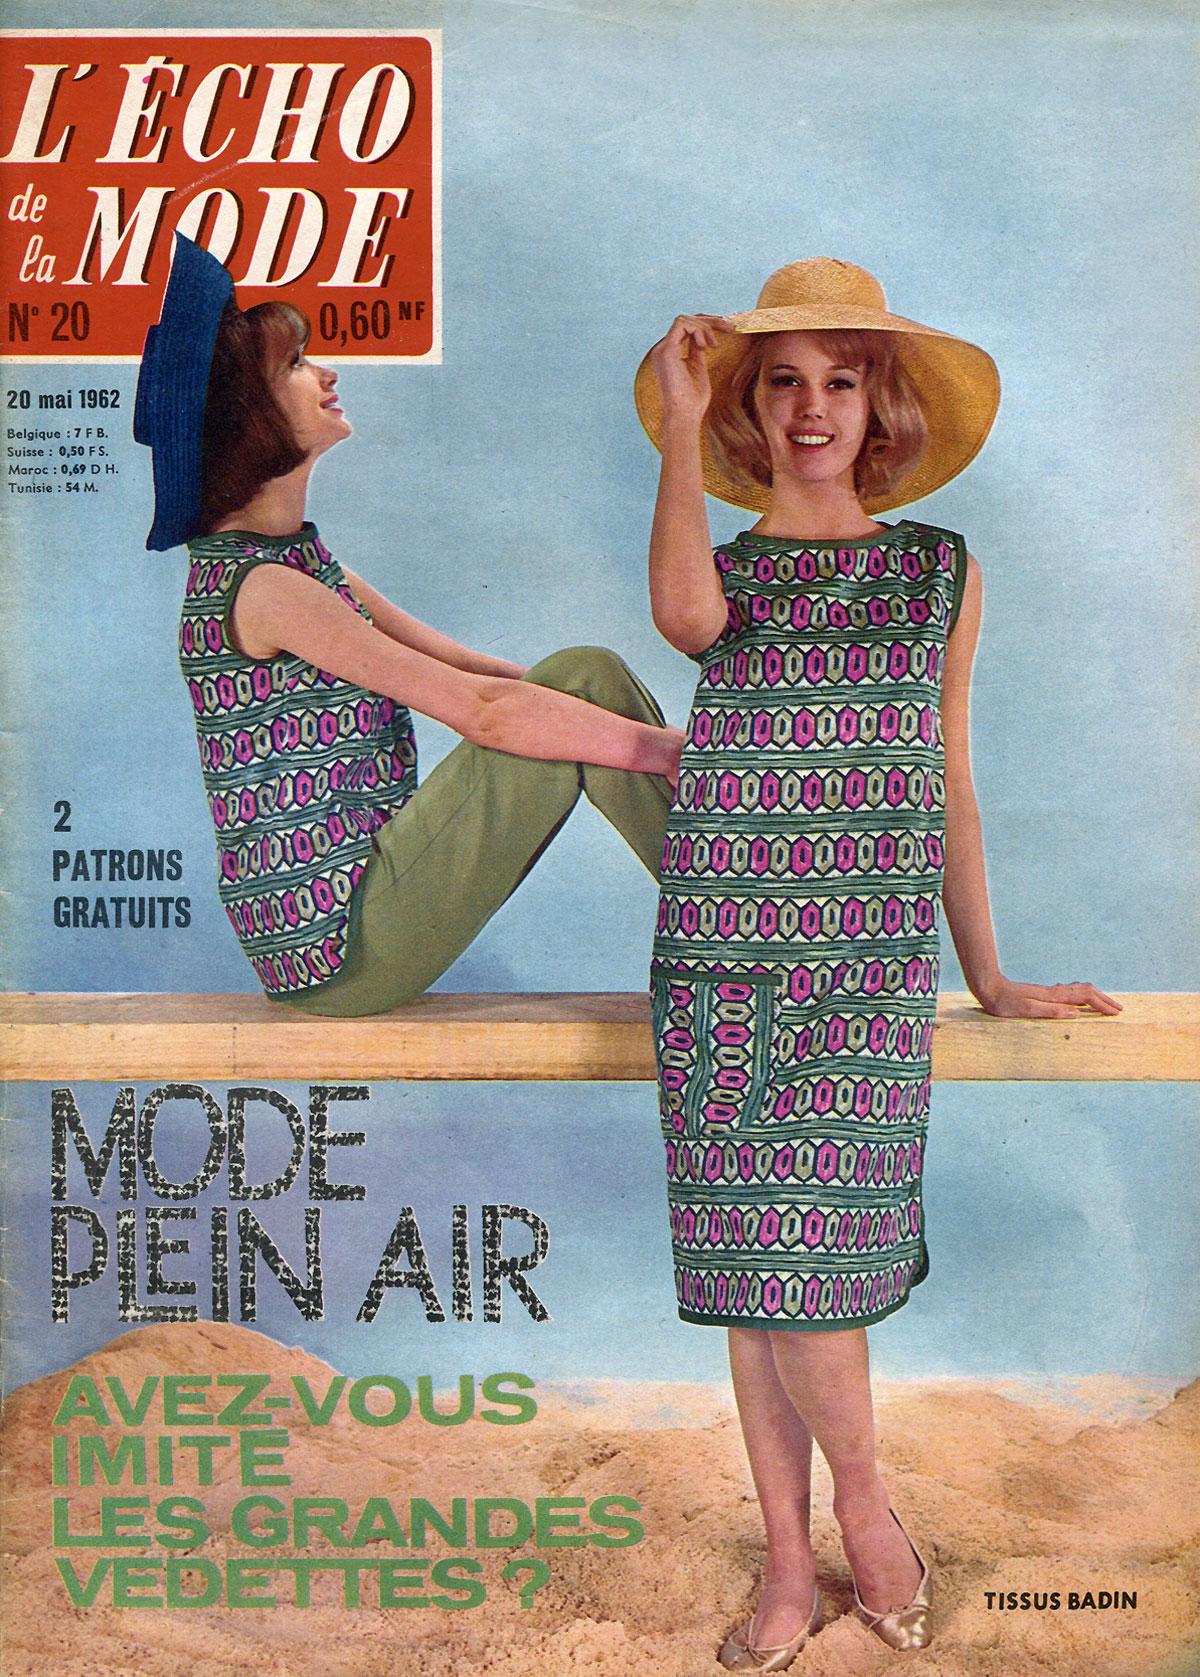 Echo de la mode, №20, mai, 1962